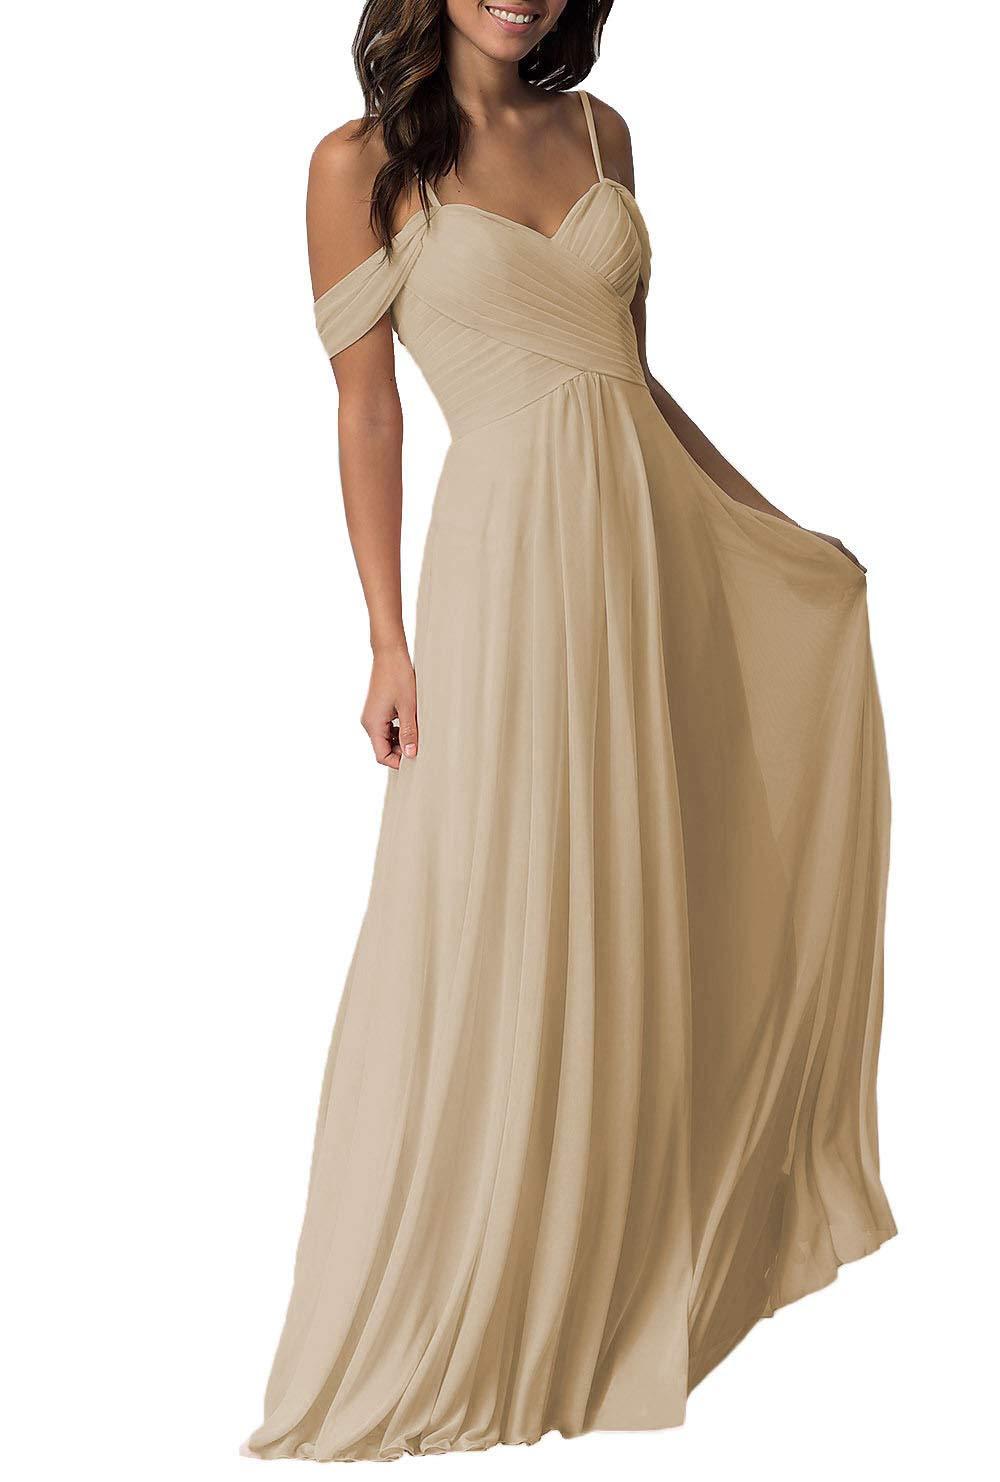 Shoulder Chiffon Wedding Bridesmaid Dresses